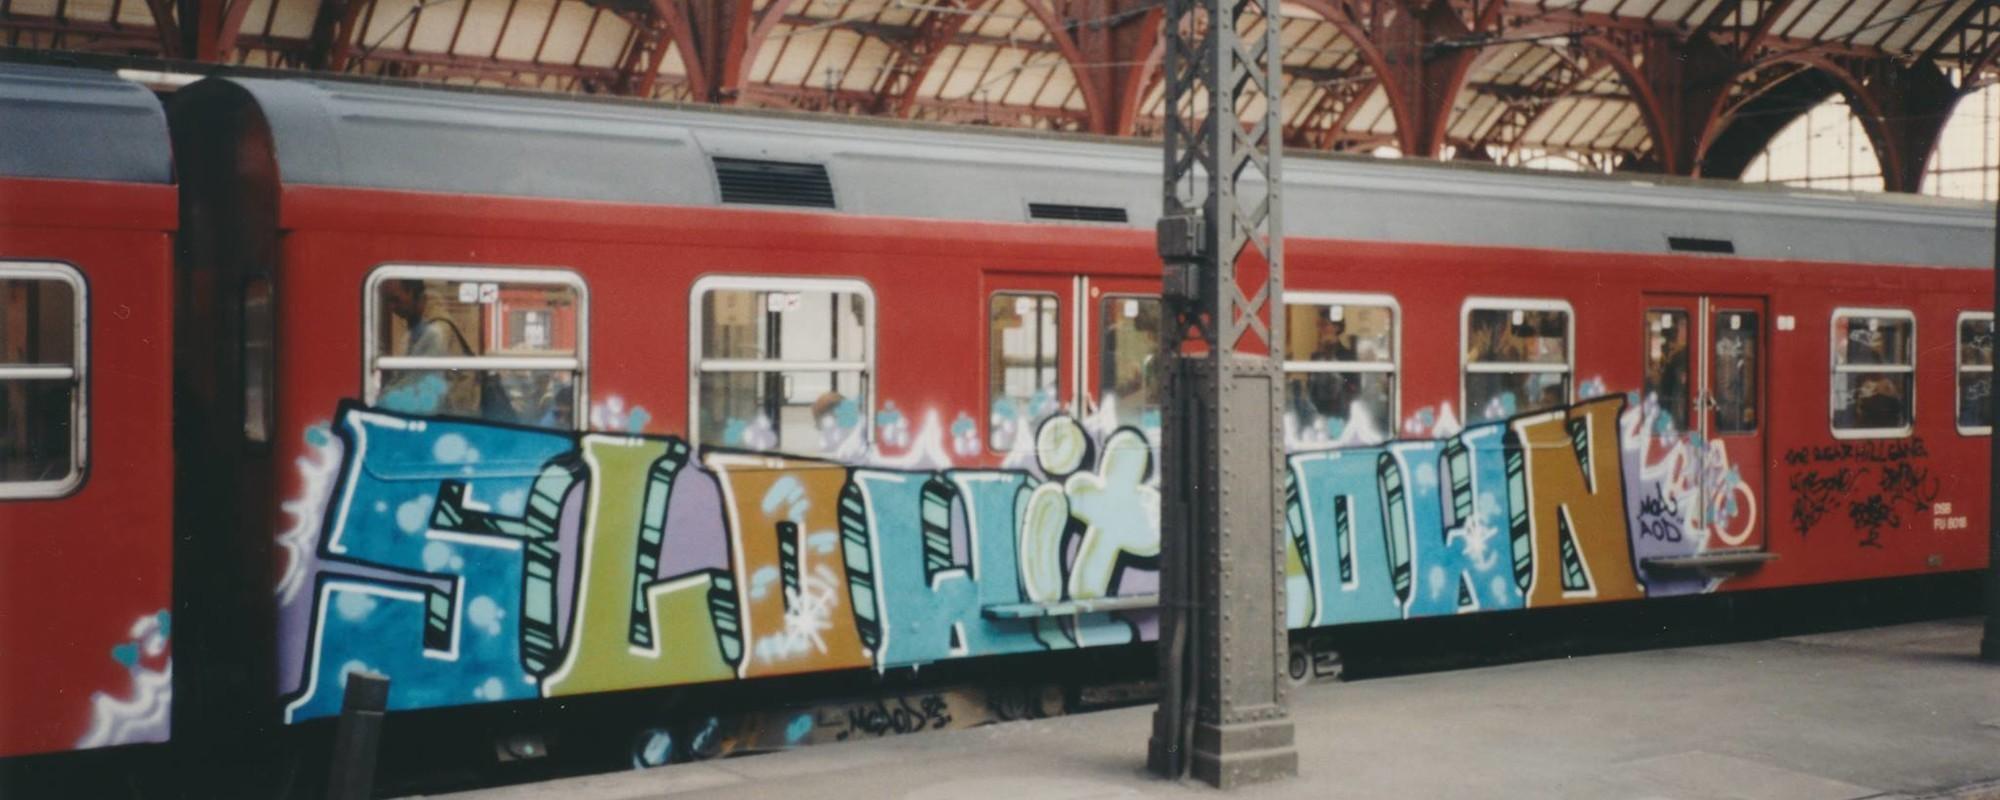 Fotos fra tre årtier med københavnsk graffiti